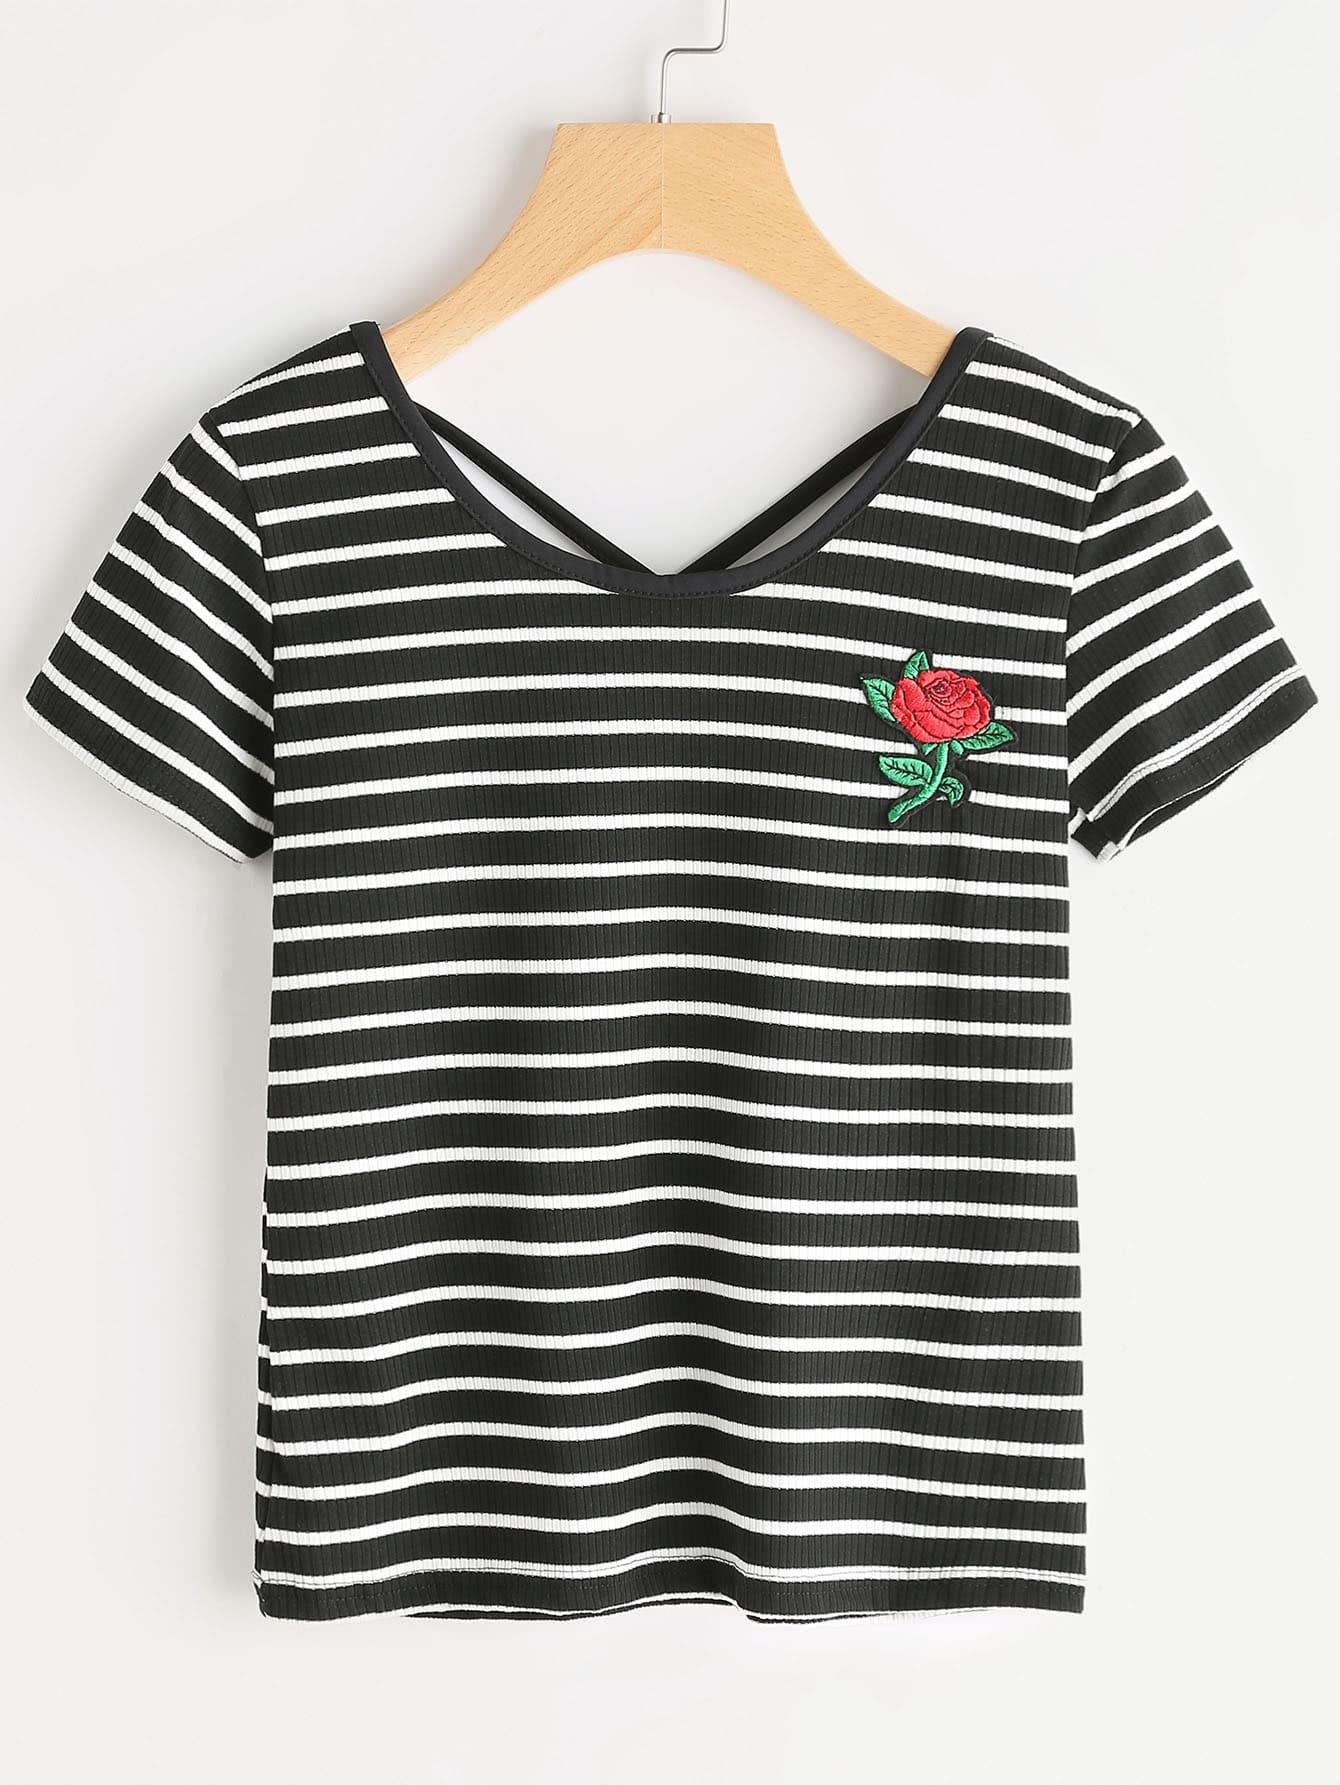 Striped Rose Patch Criss Cross Back Tshirt striped longline tshirt